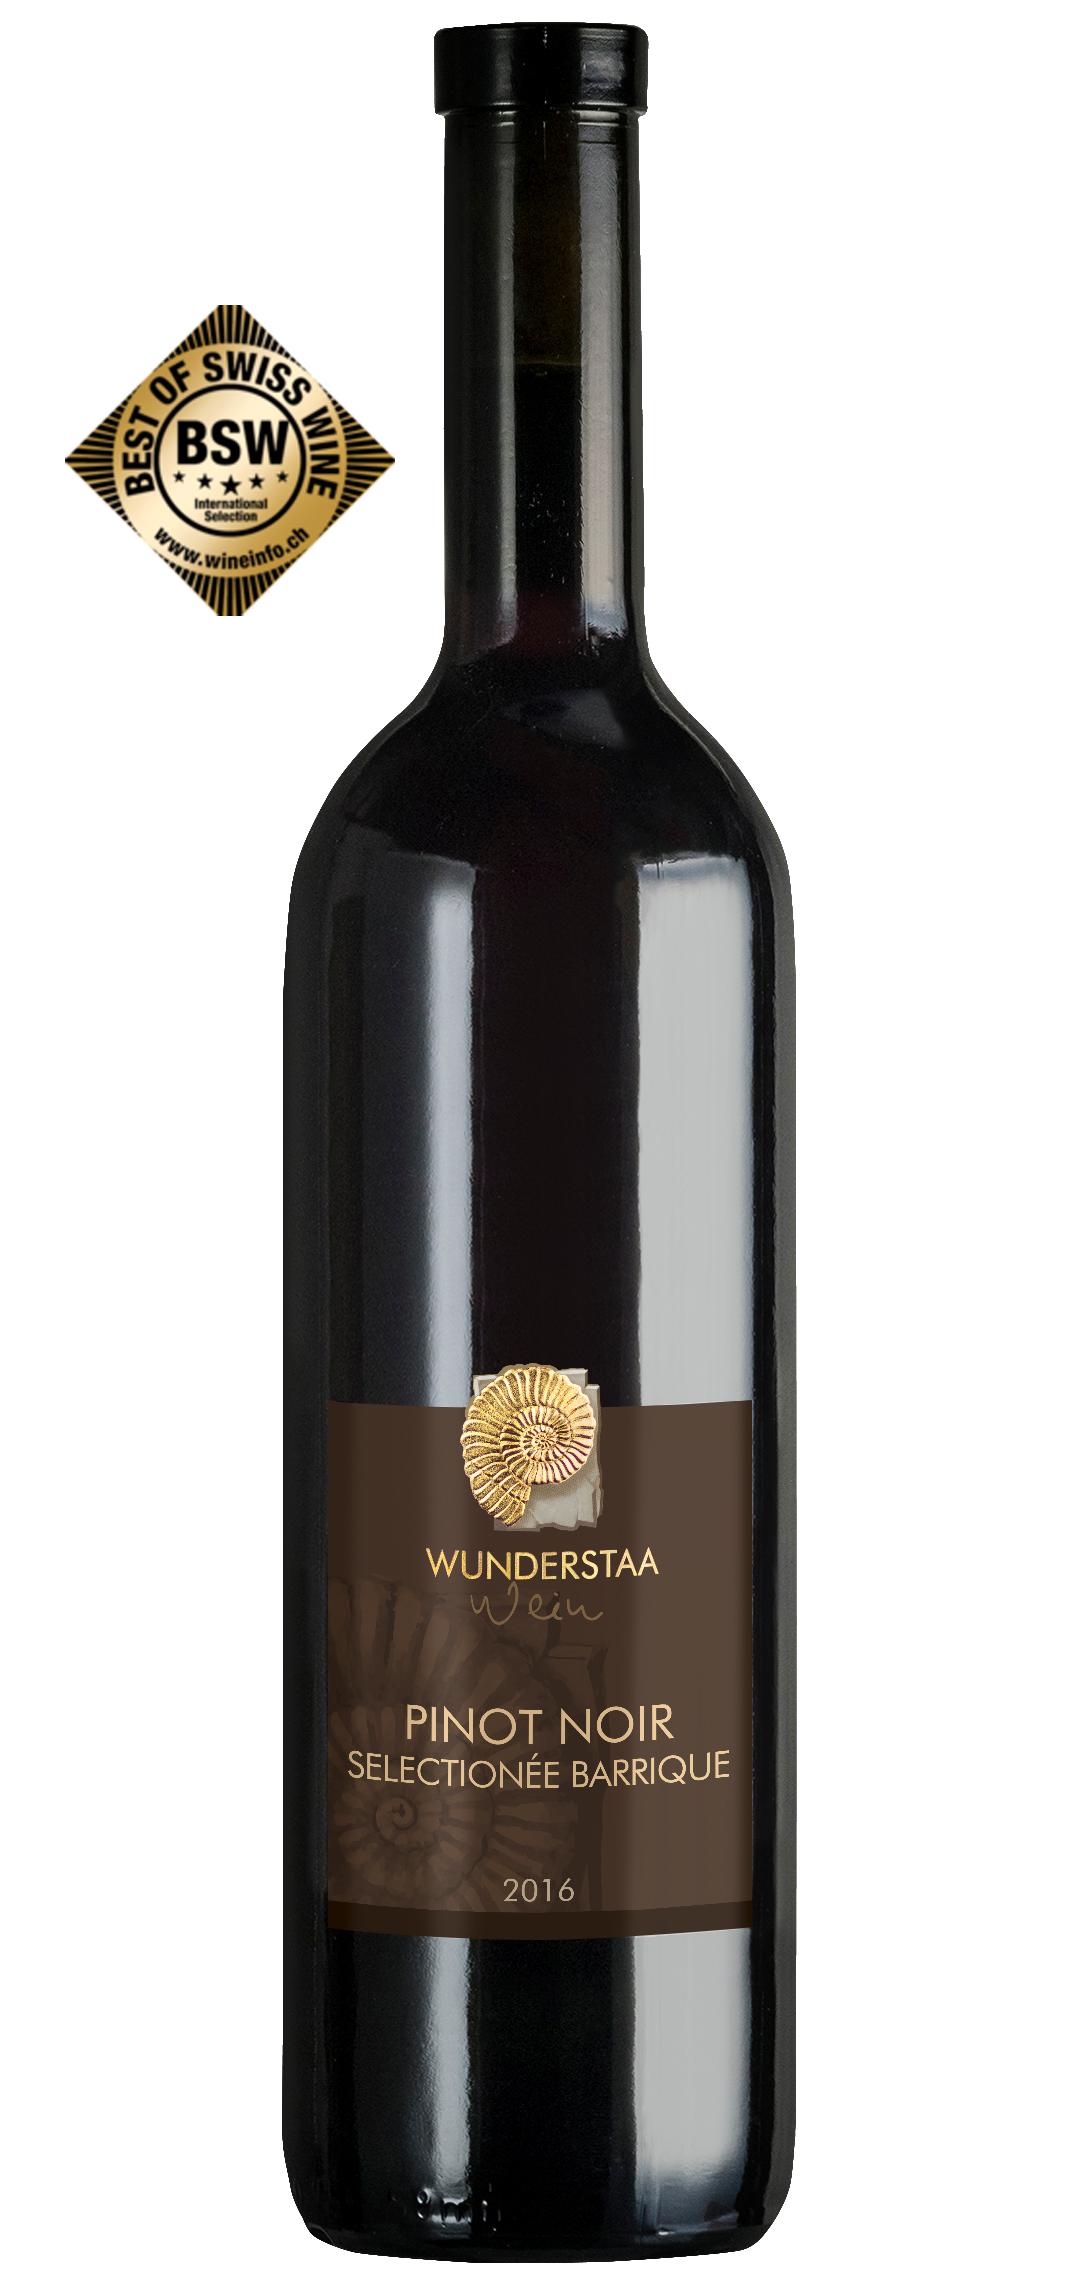 Wunderstaa - Pinot Noir 'Sélectionné Barrique' Red Wine (75 CL)